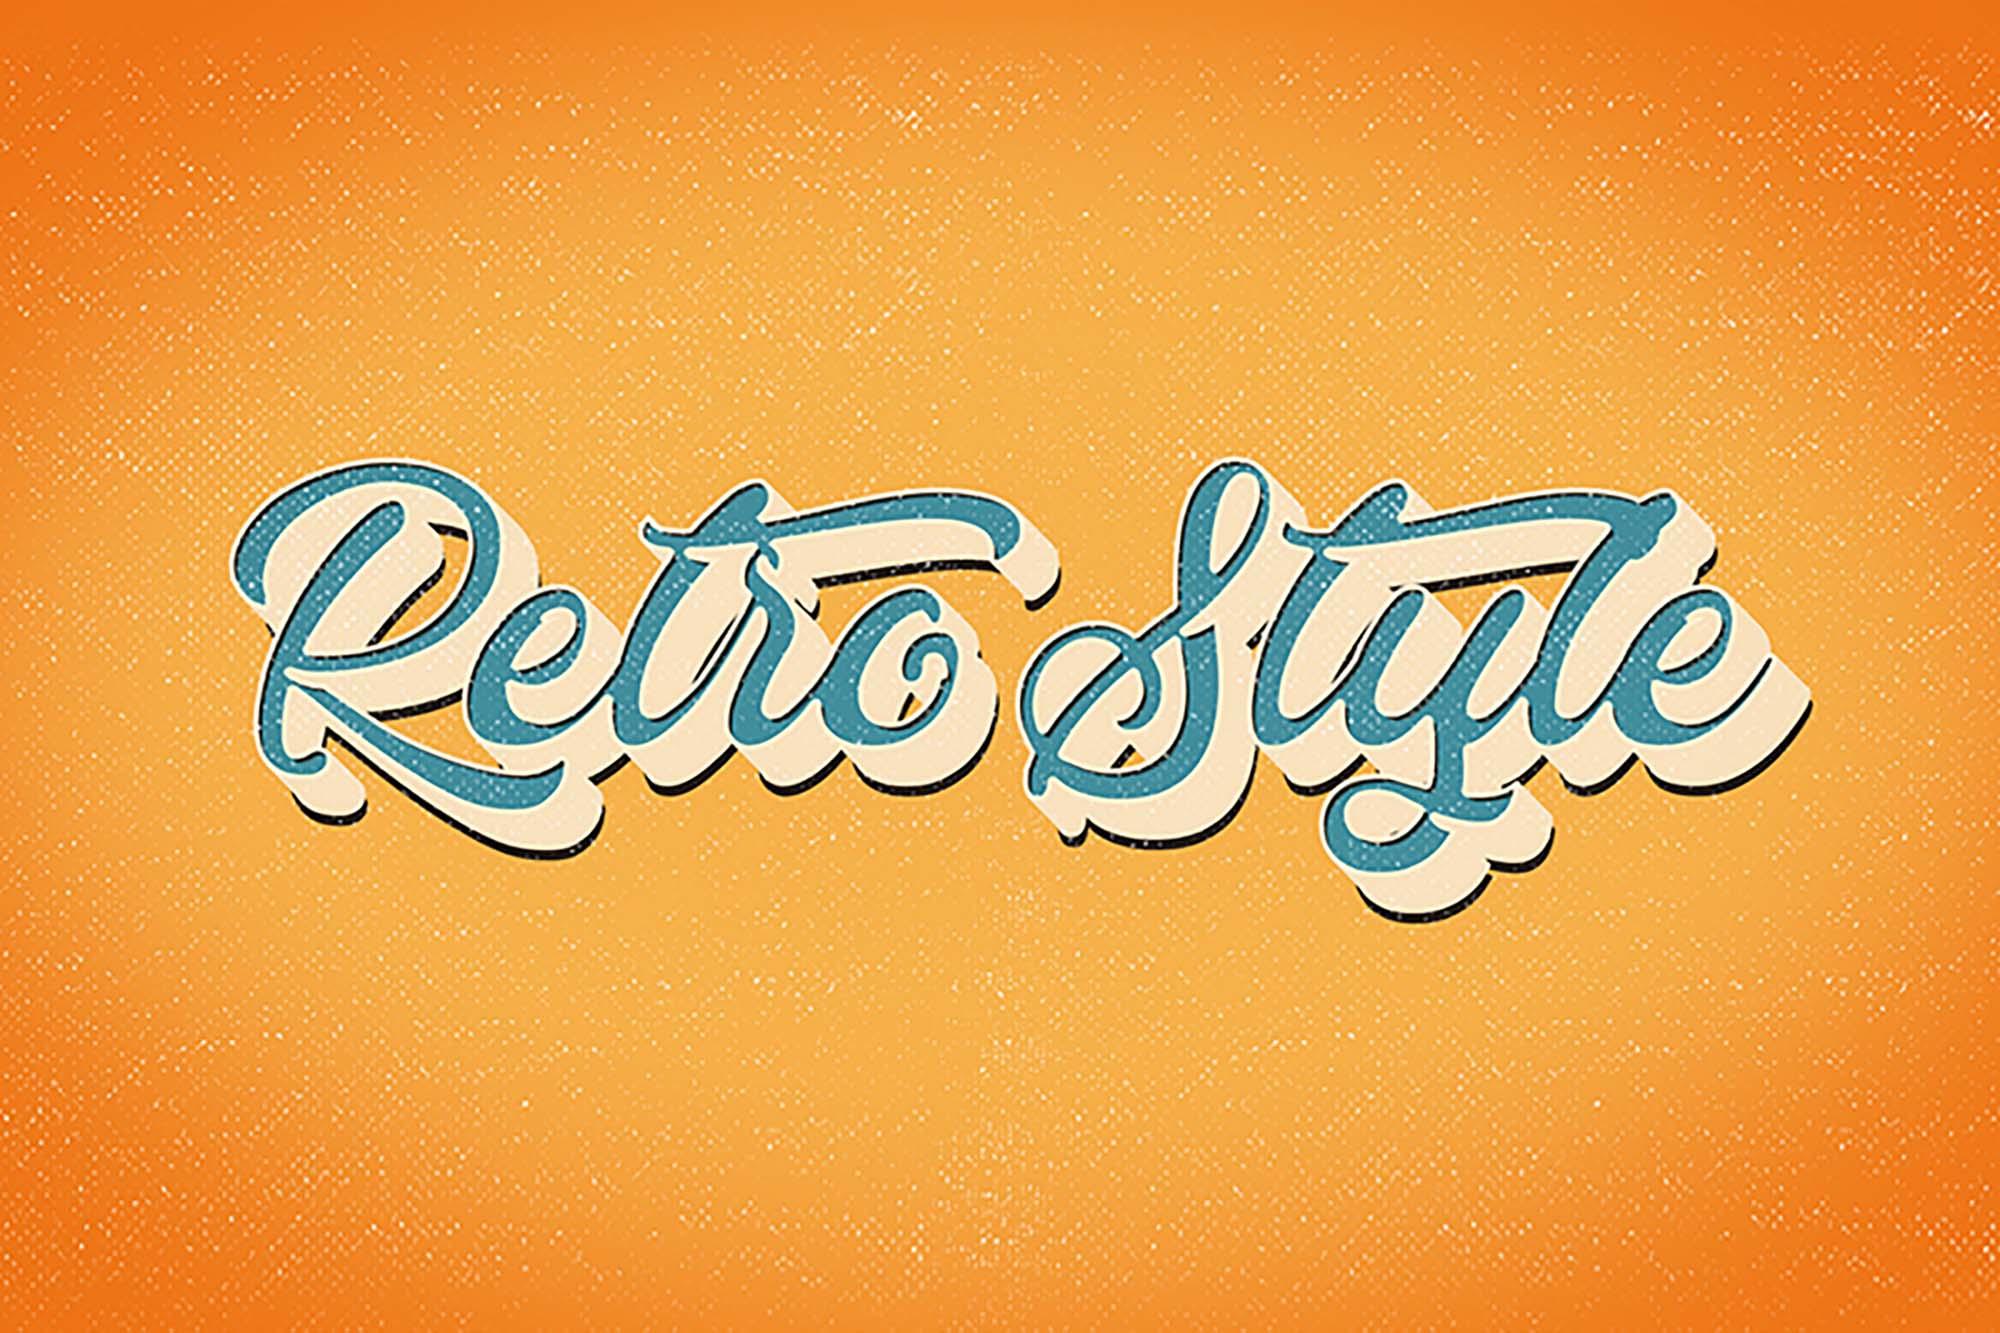 Retro Vintage Text Effect 3